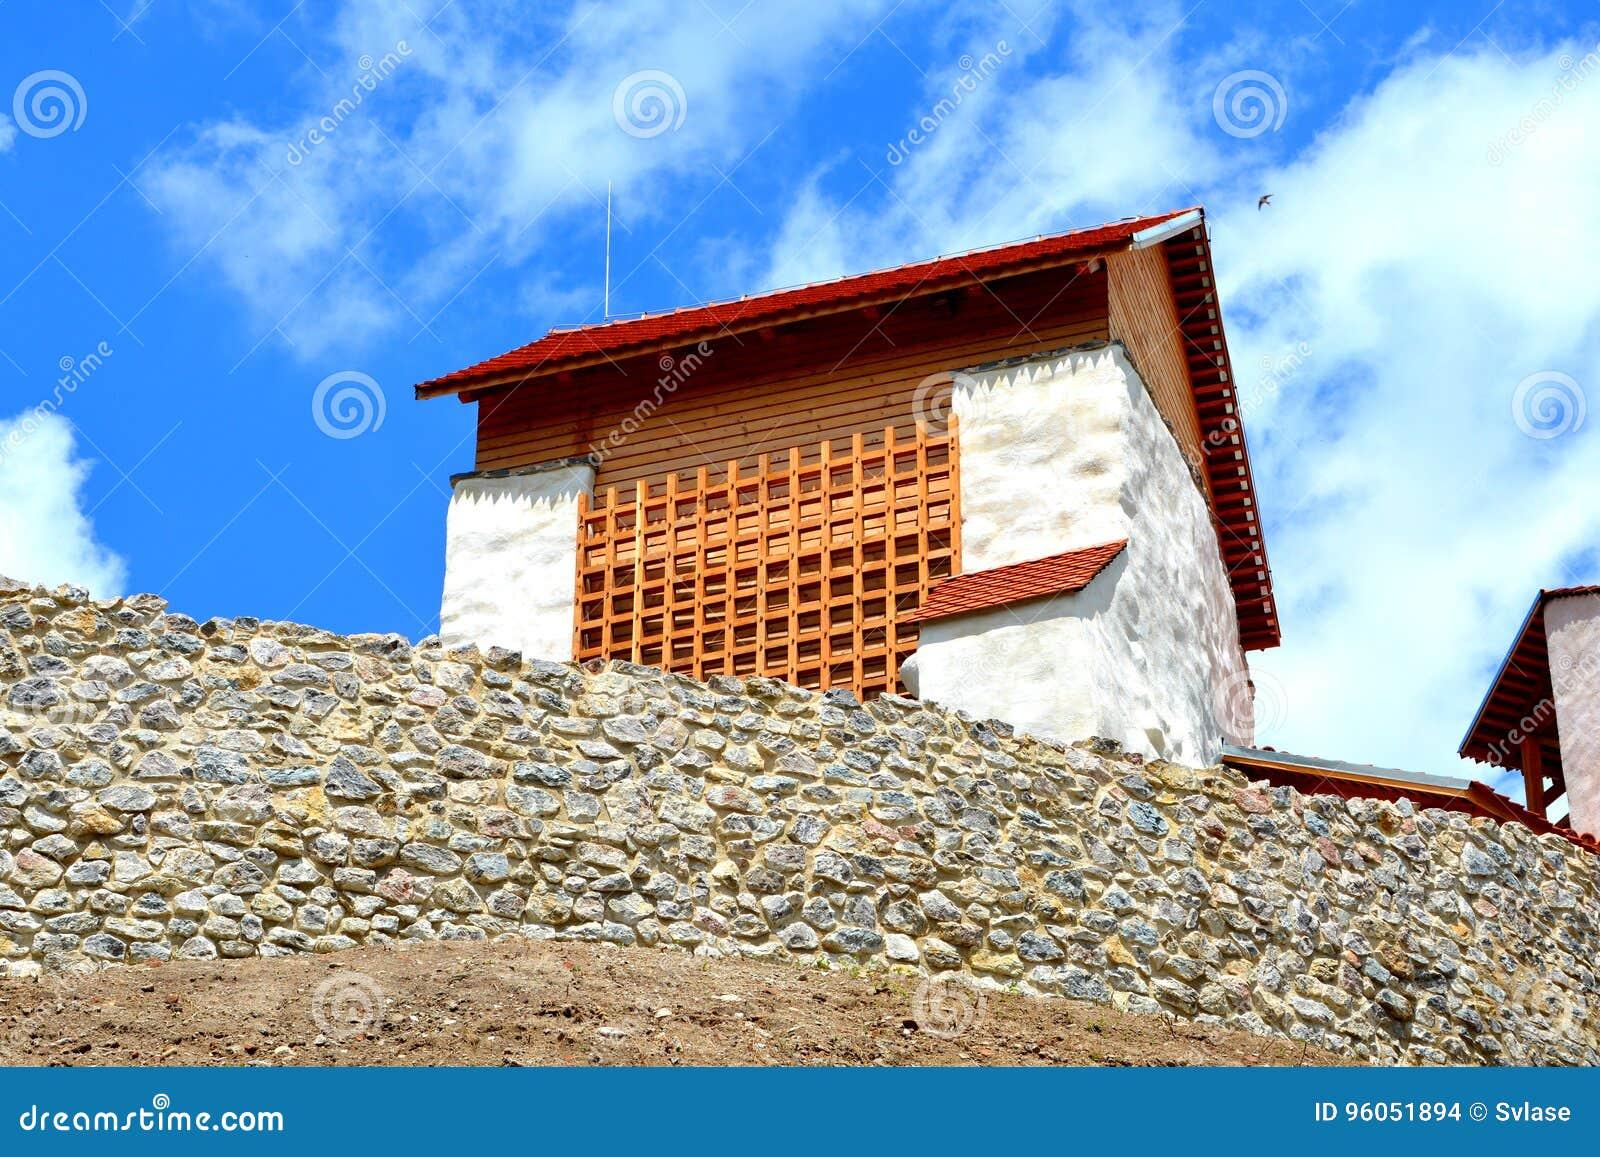 Forteresse saxonne médiévale dans le village Feldioara, la Transylvanie